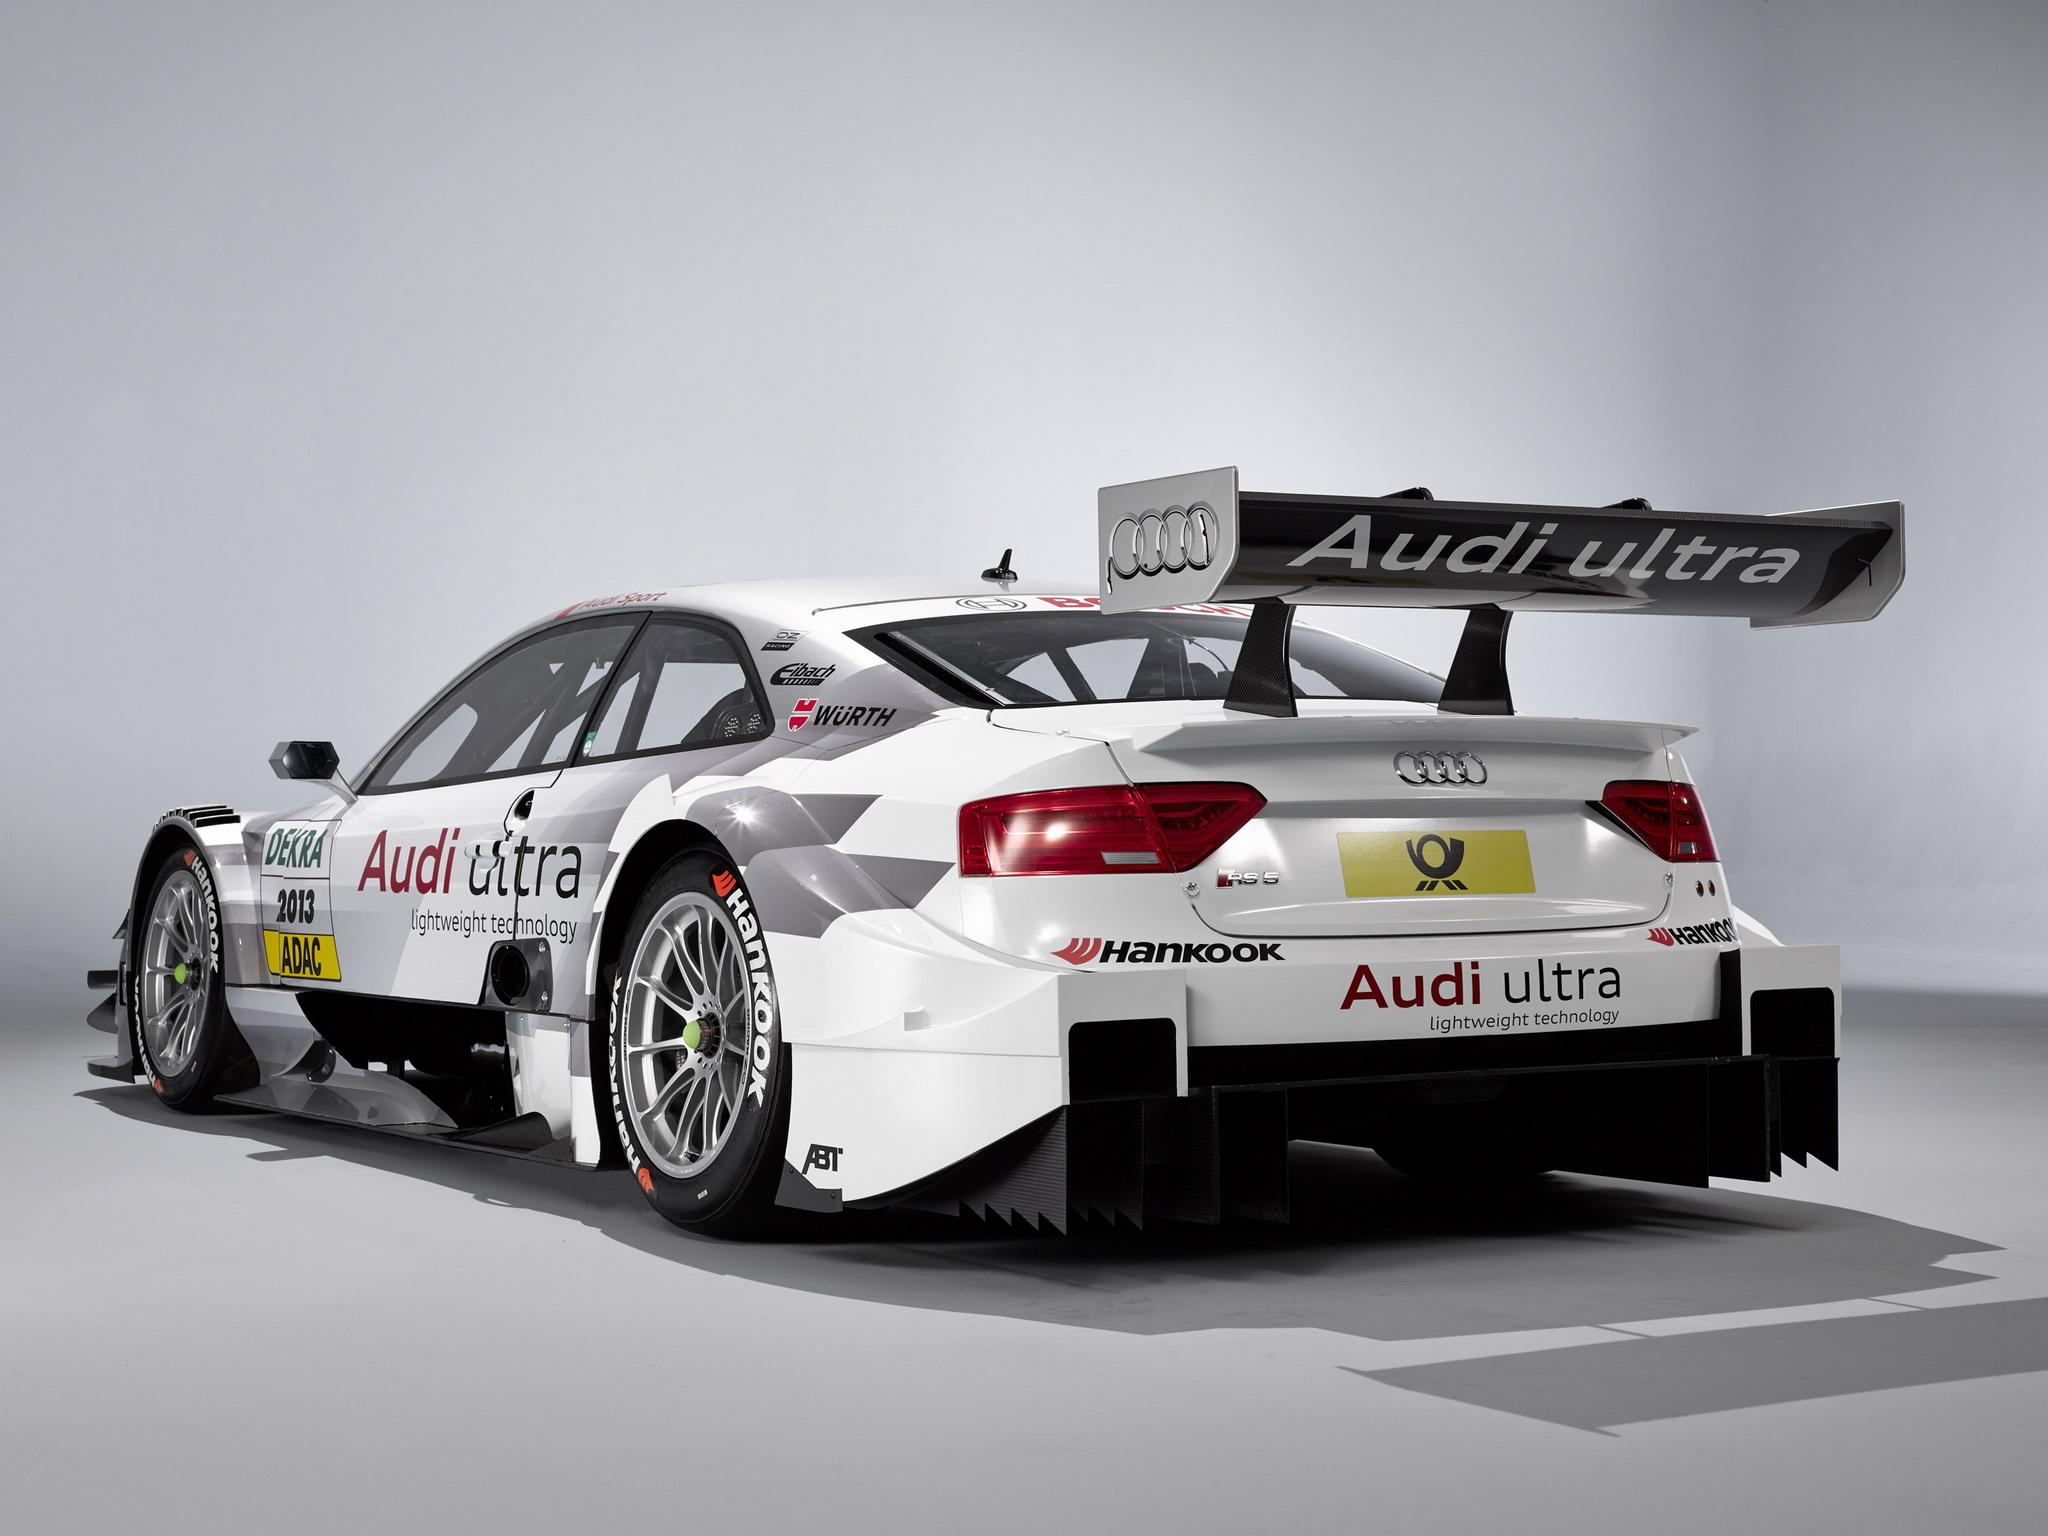 2013 Audi Rs5 Coupe Dtm Race Racing G Wallpaper 2048x1536 95369 Wallpaperup 2013 audi rs 5 dtm 2 wallpaper